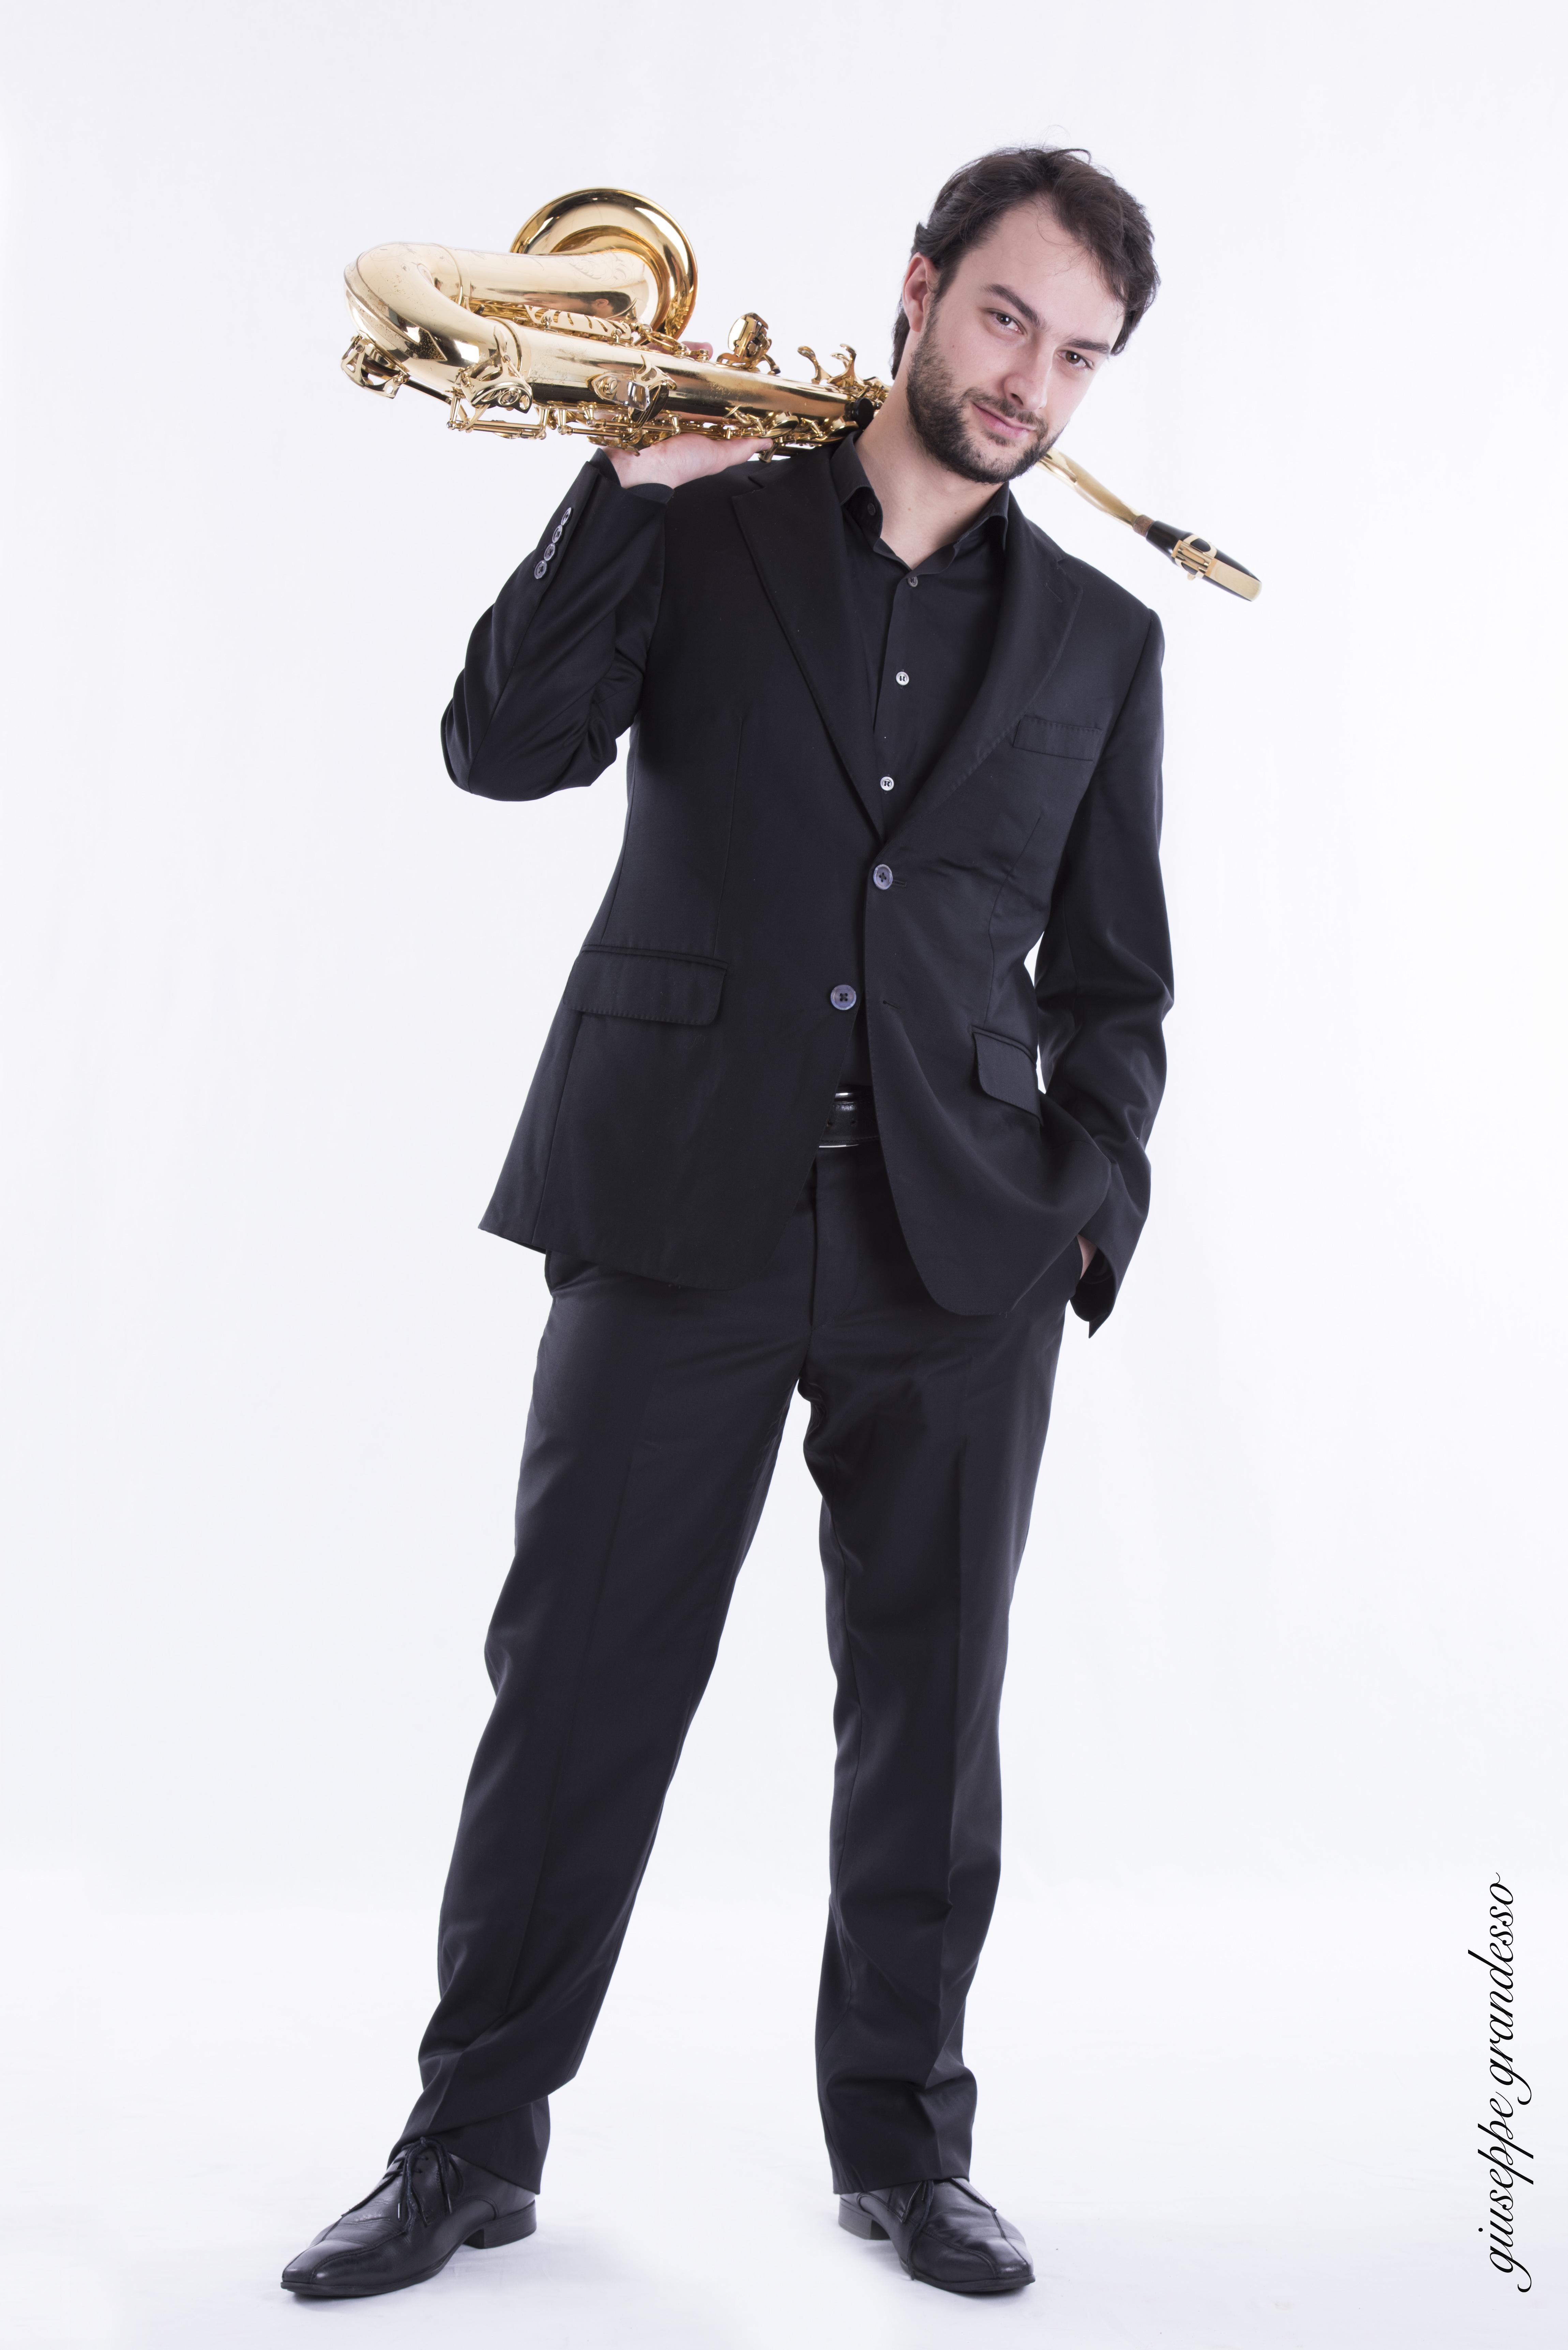 Massimiliano Girardi - Bio